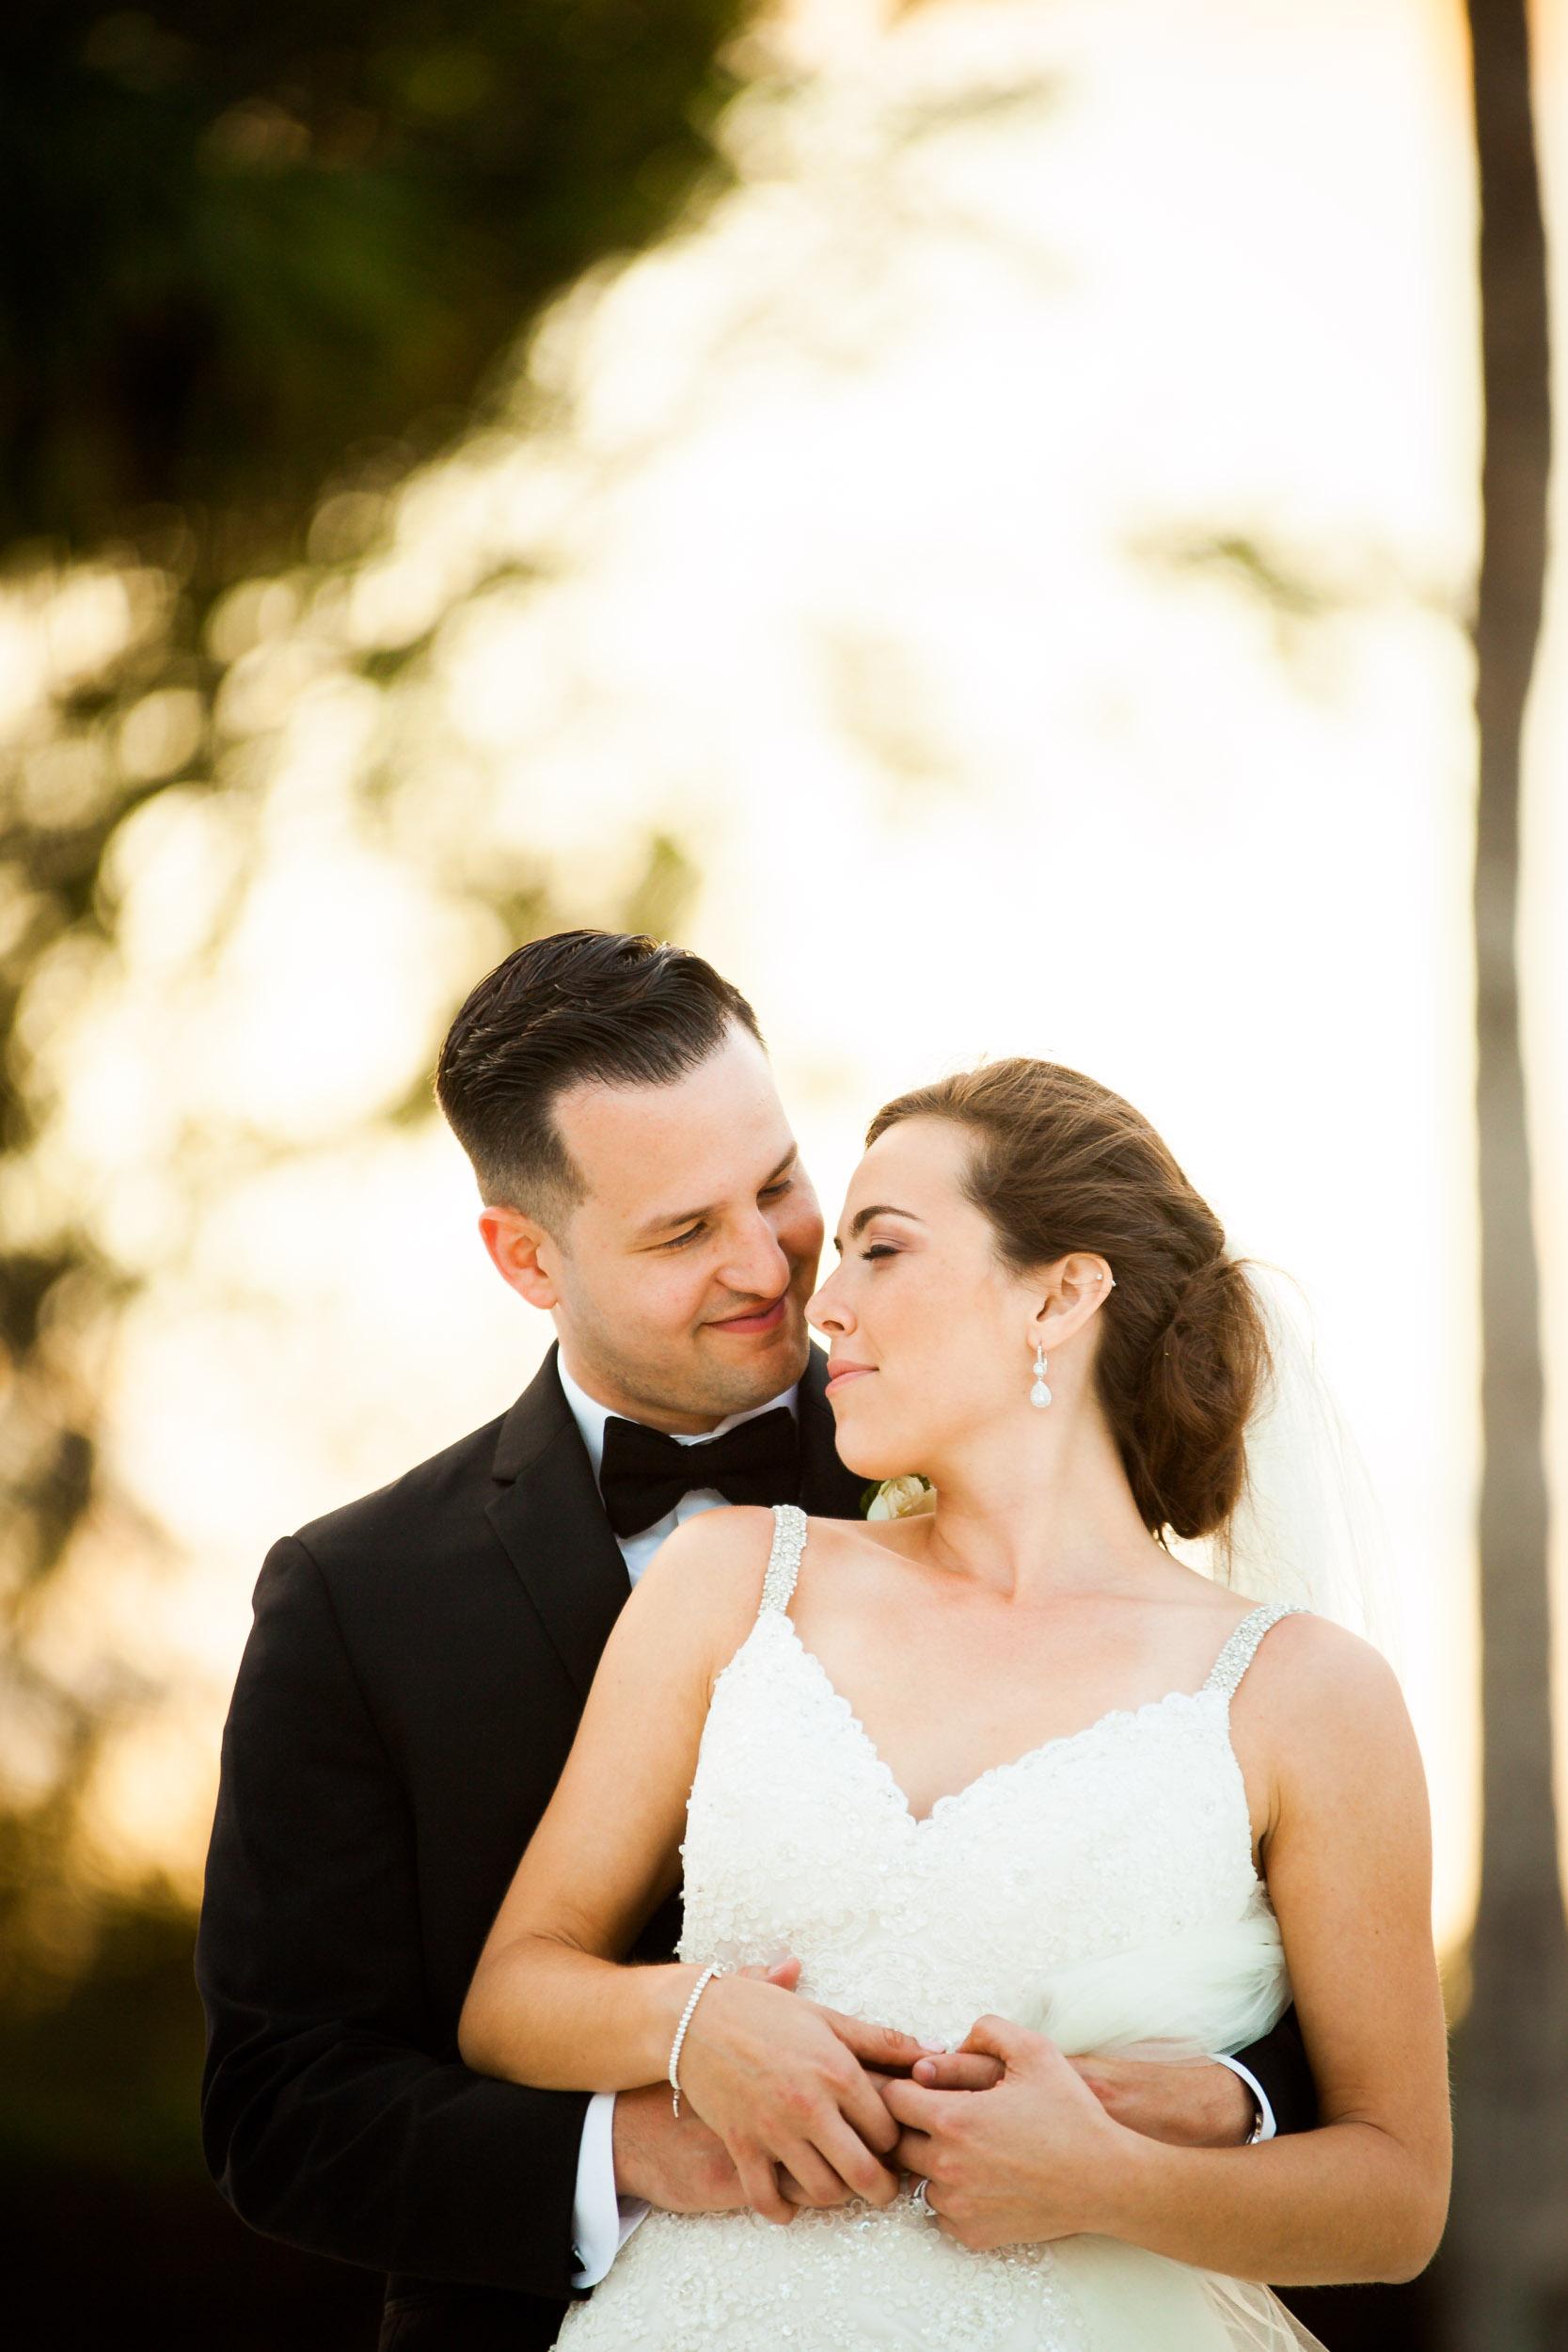 Flordia-Wedding-Photography-48.jpg